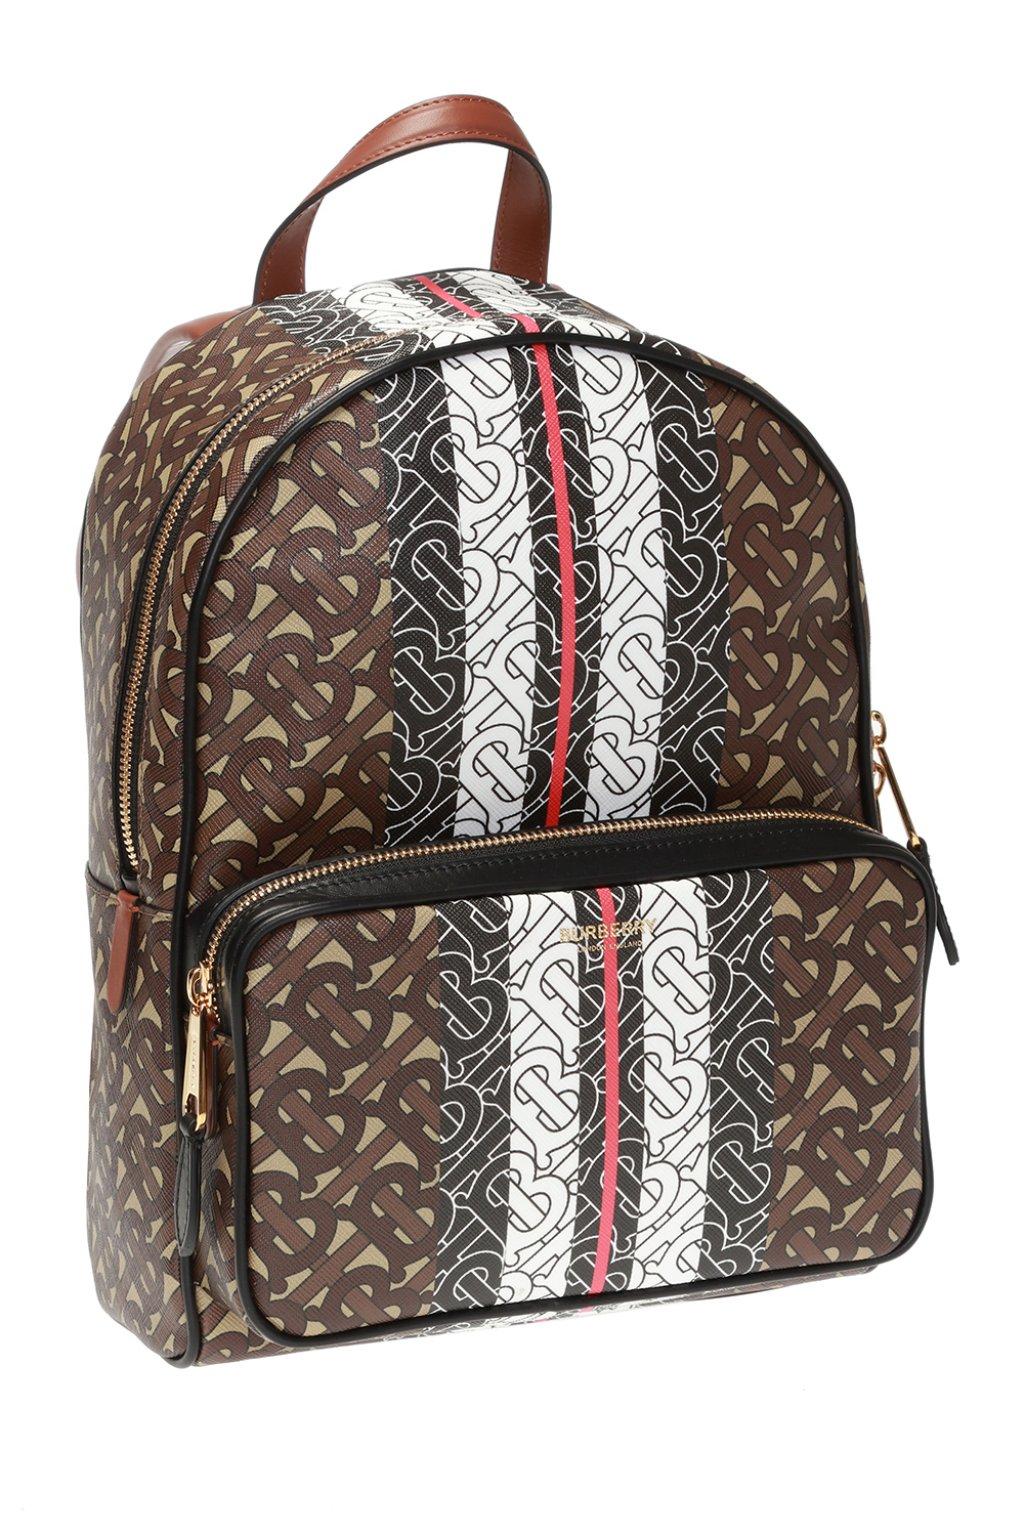 Burberry 'TB' logo backpack